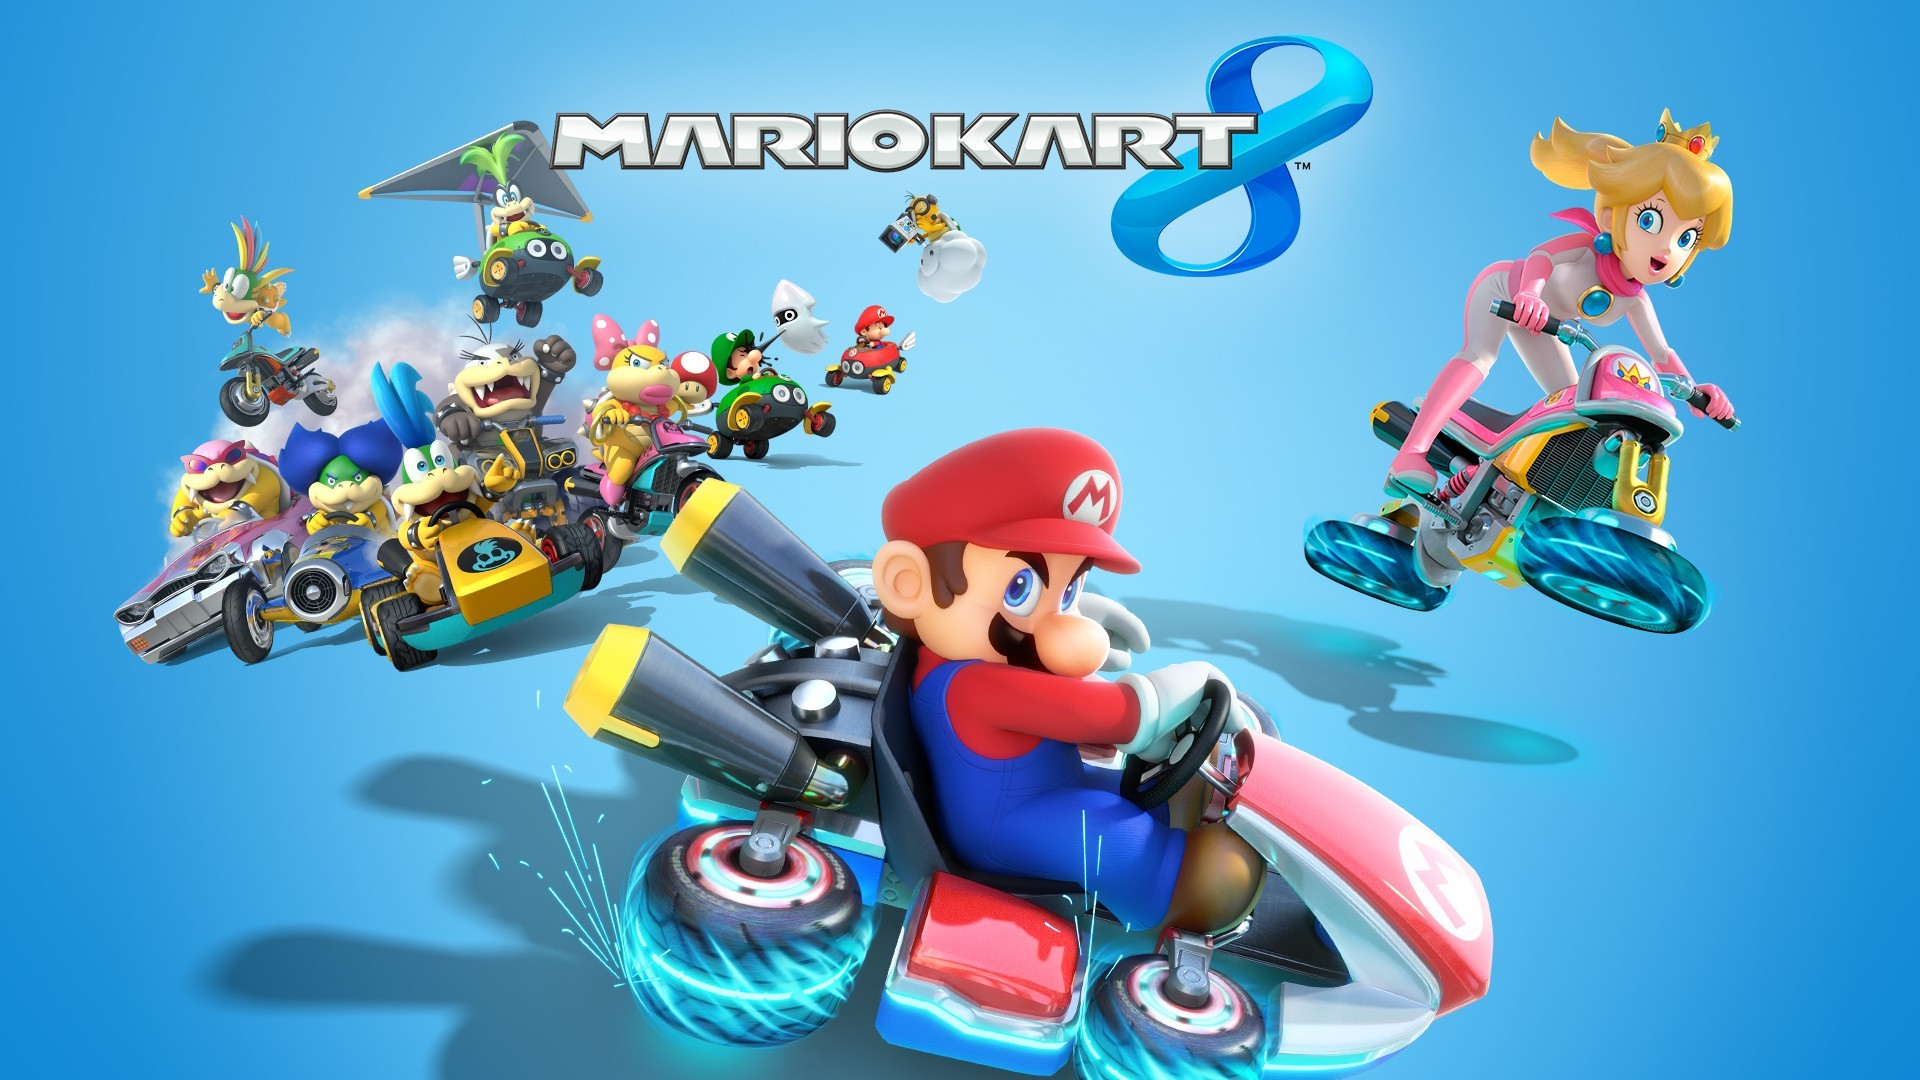 Mario Kart 8, Video Games, Toad (character), Mario Bros.,